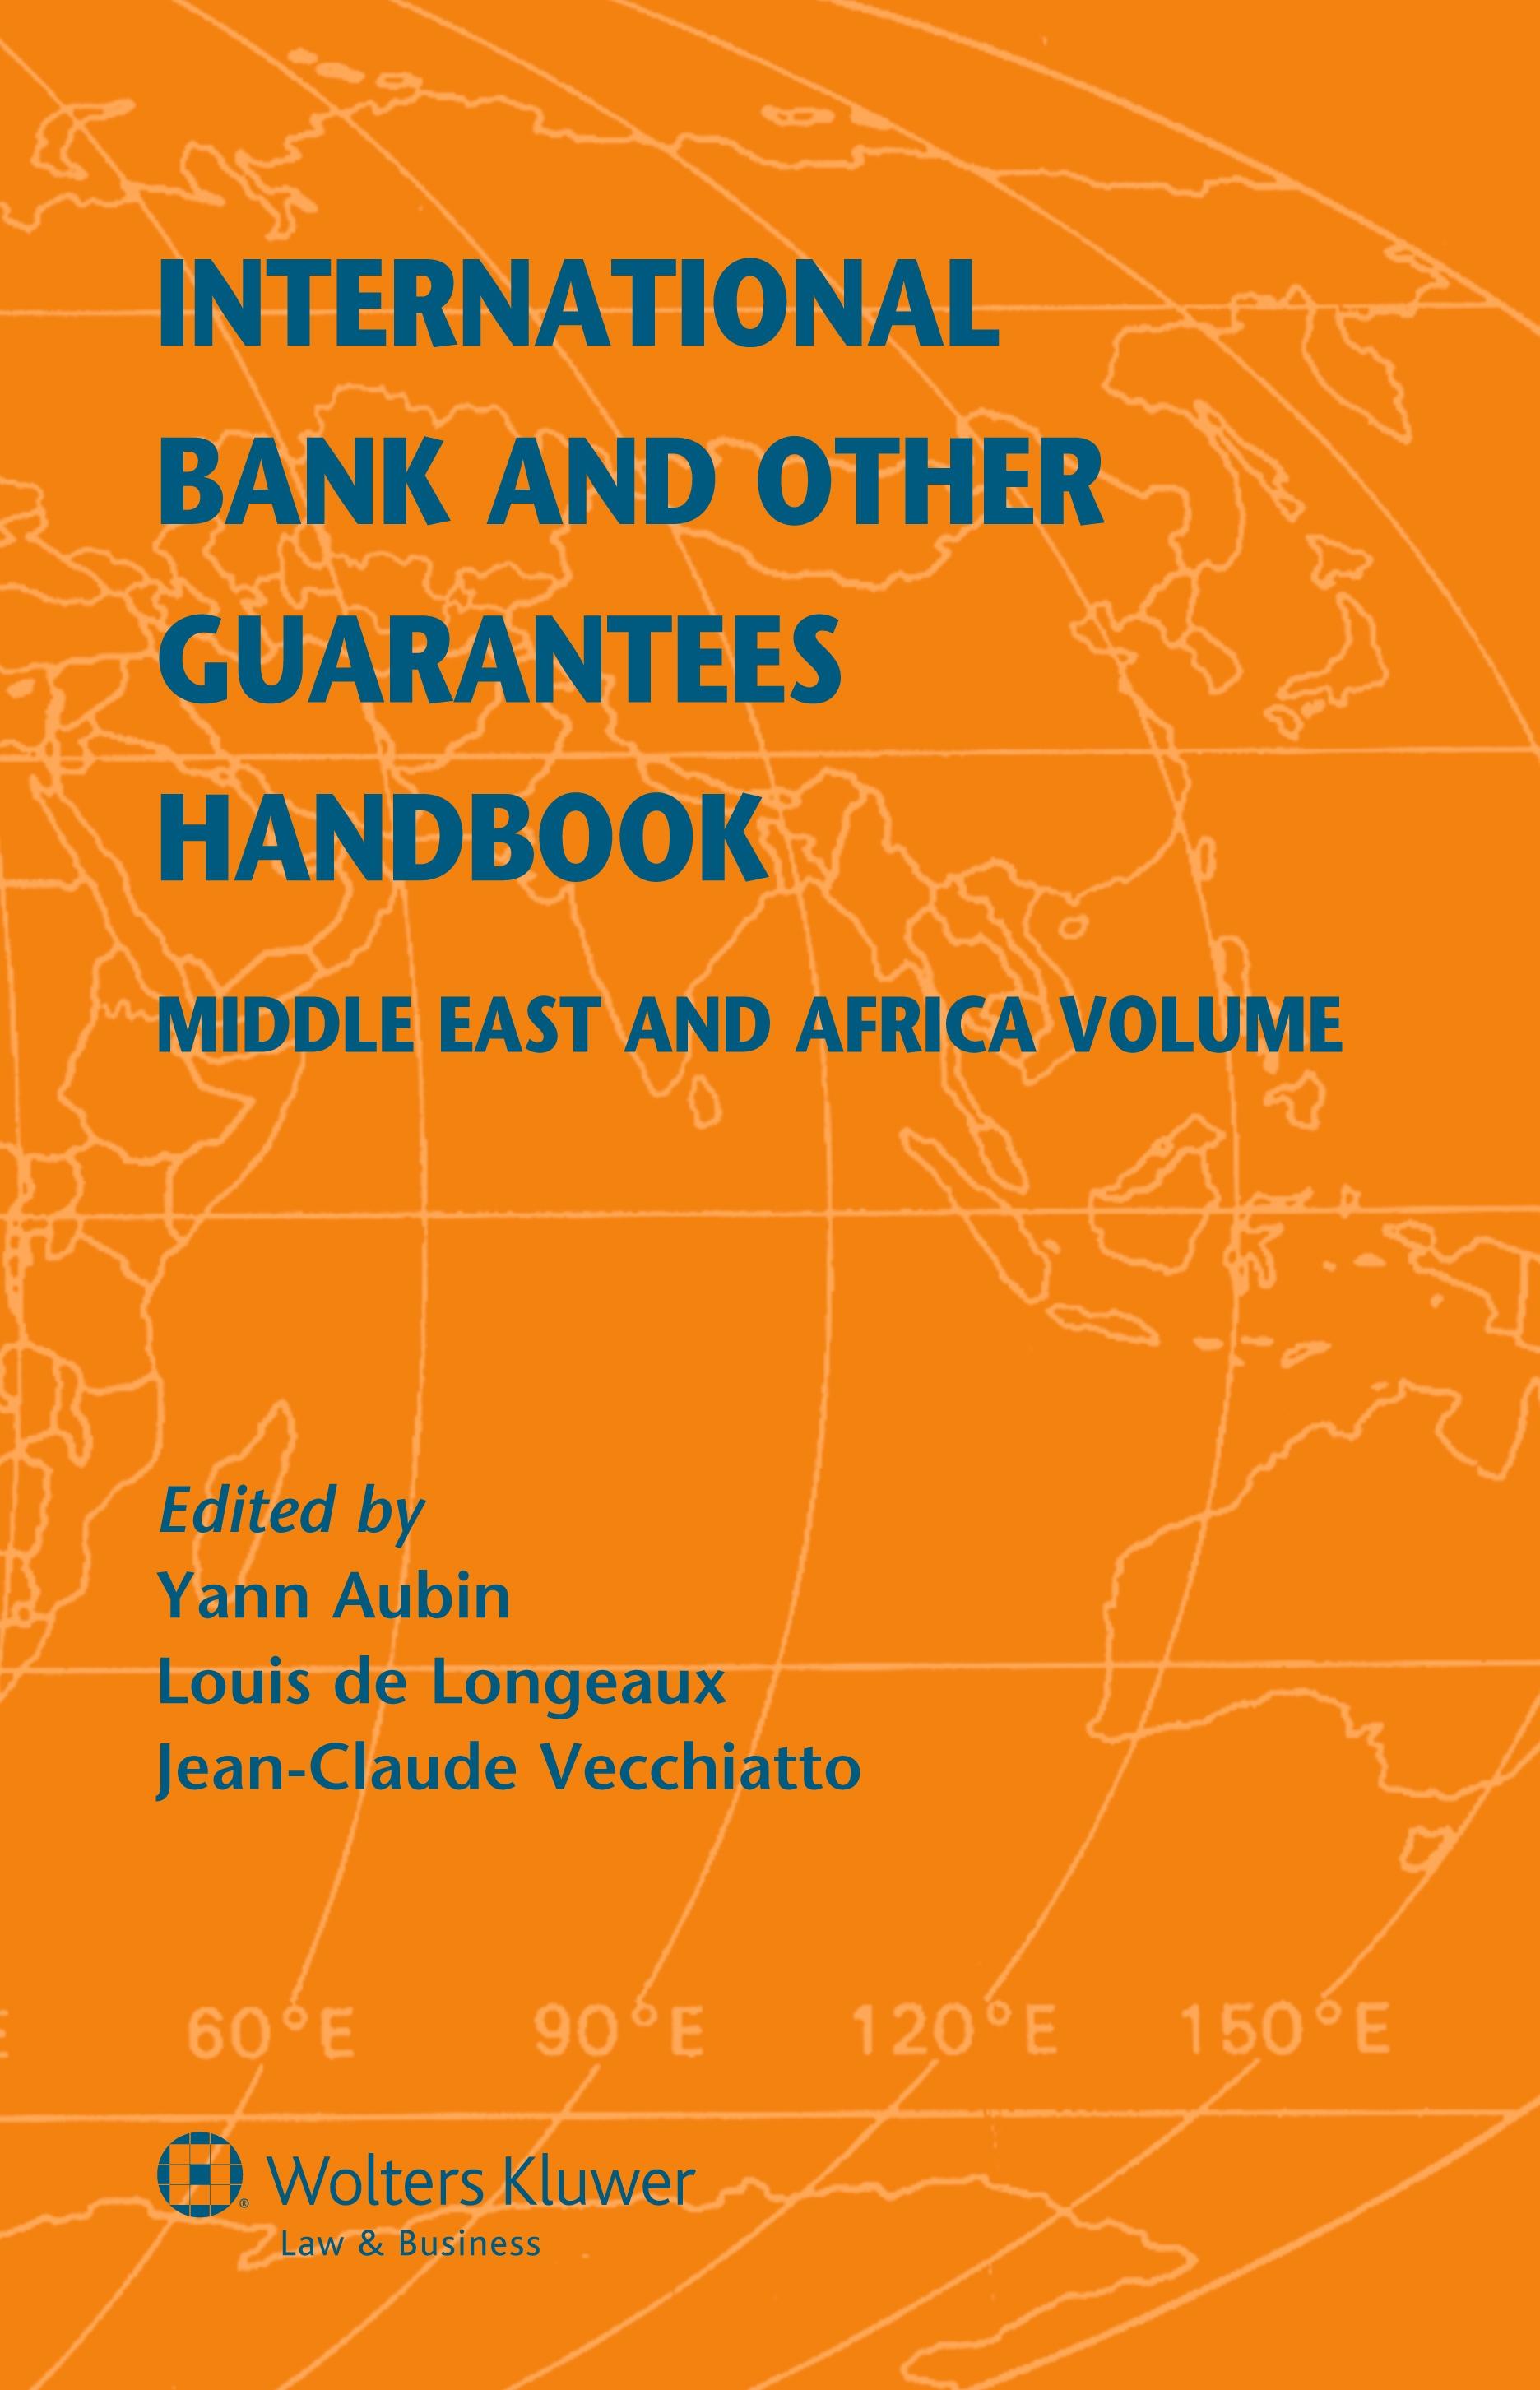 International Bank and Other Guarantees Handbook